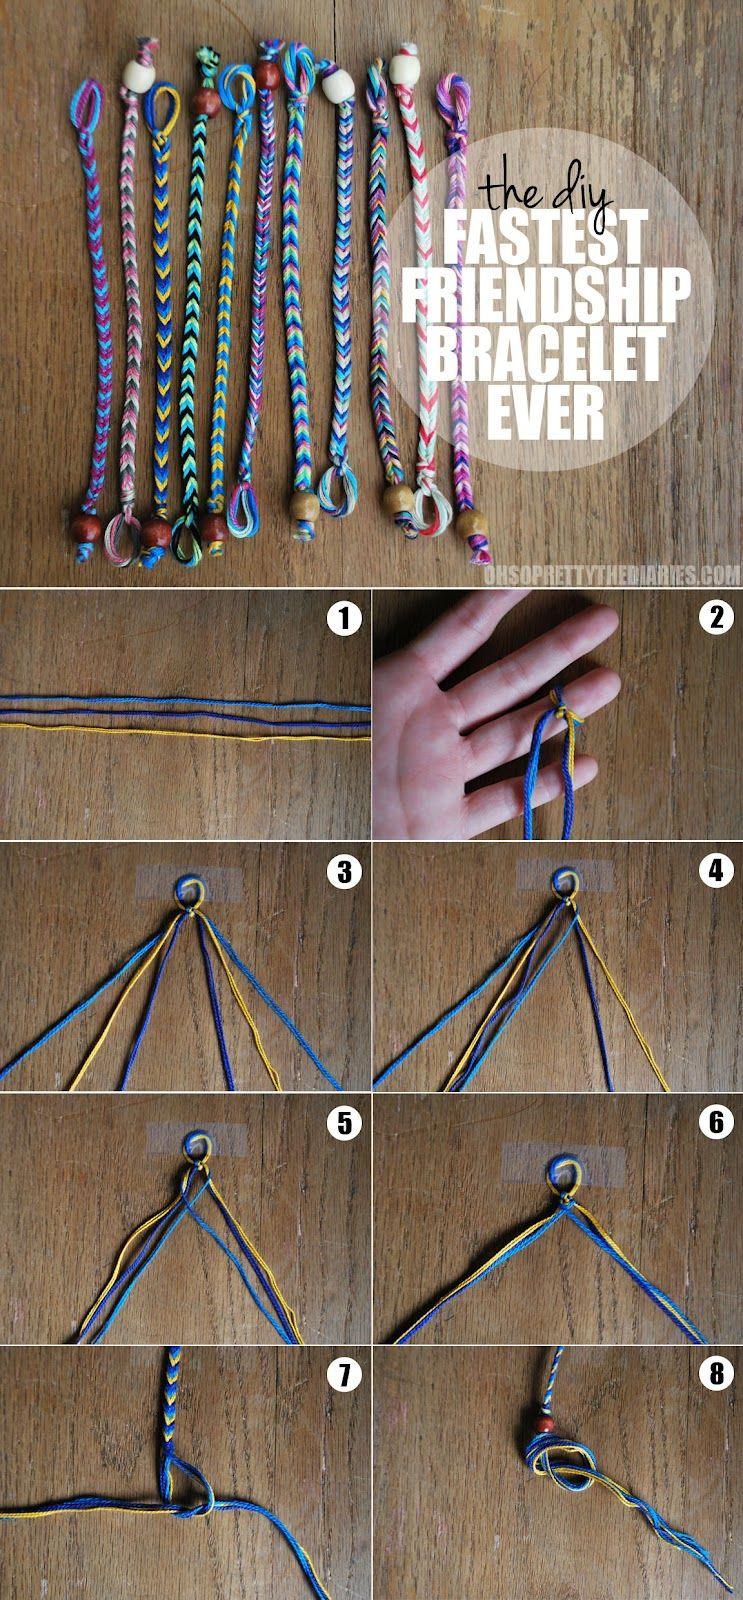 Download Great DIY Bracelets from heywandererblog.com